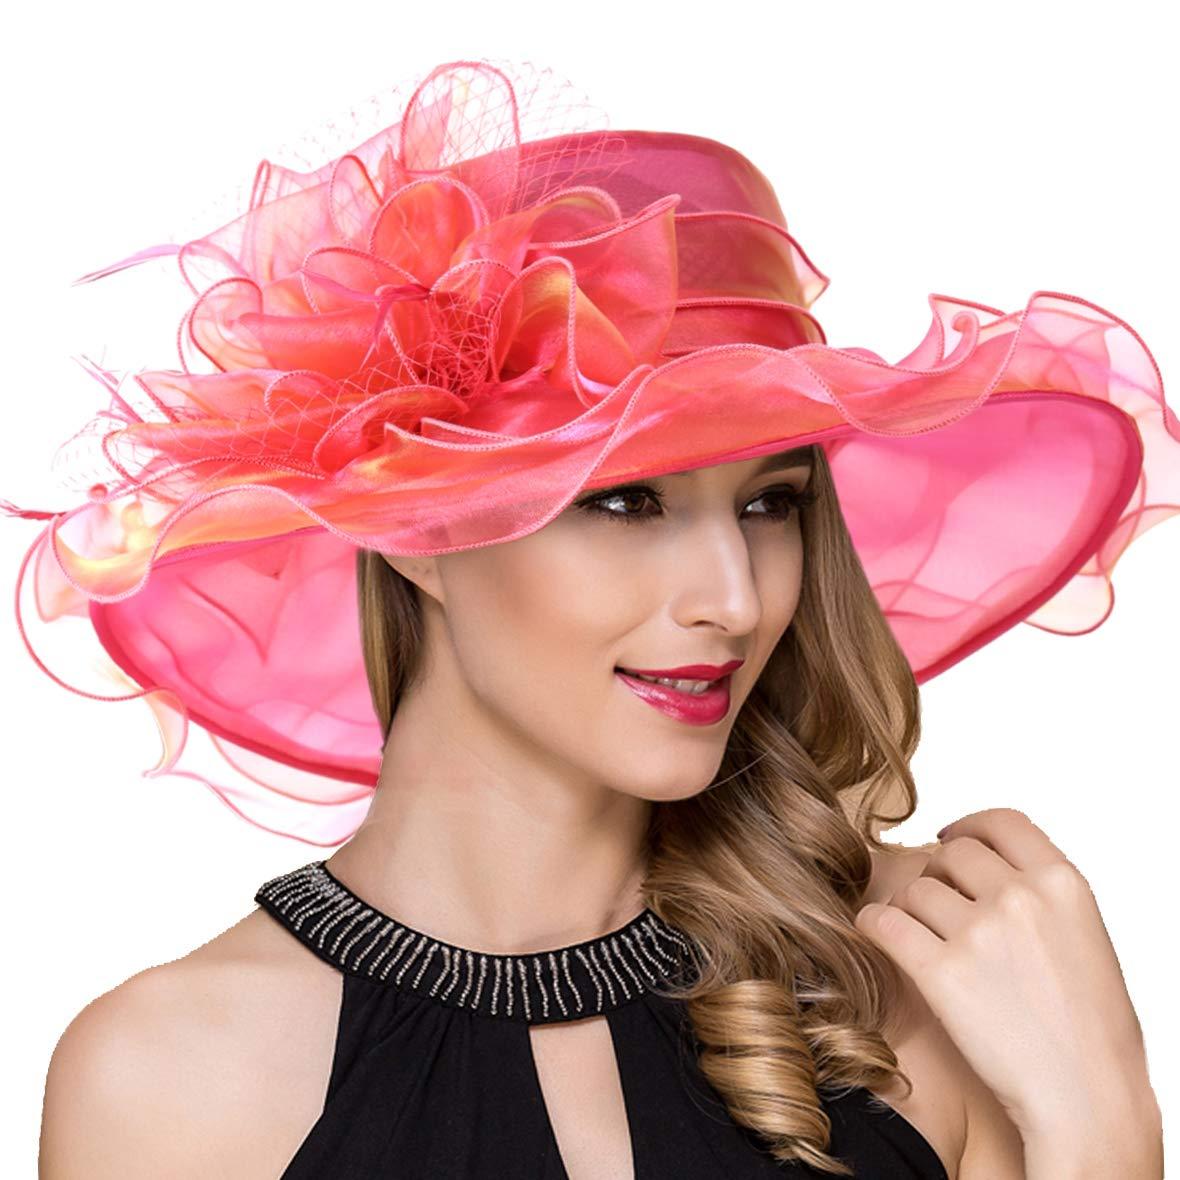 Women Kentucky Derby Church Dress Fascinator Wide Brim Tea Party Wedding Organza Hats S042b (S042-Watermelon) by Ruphedy